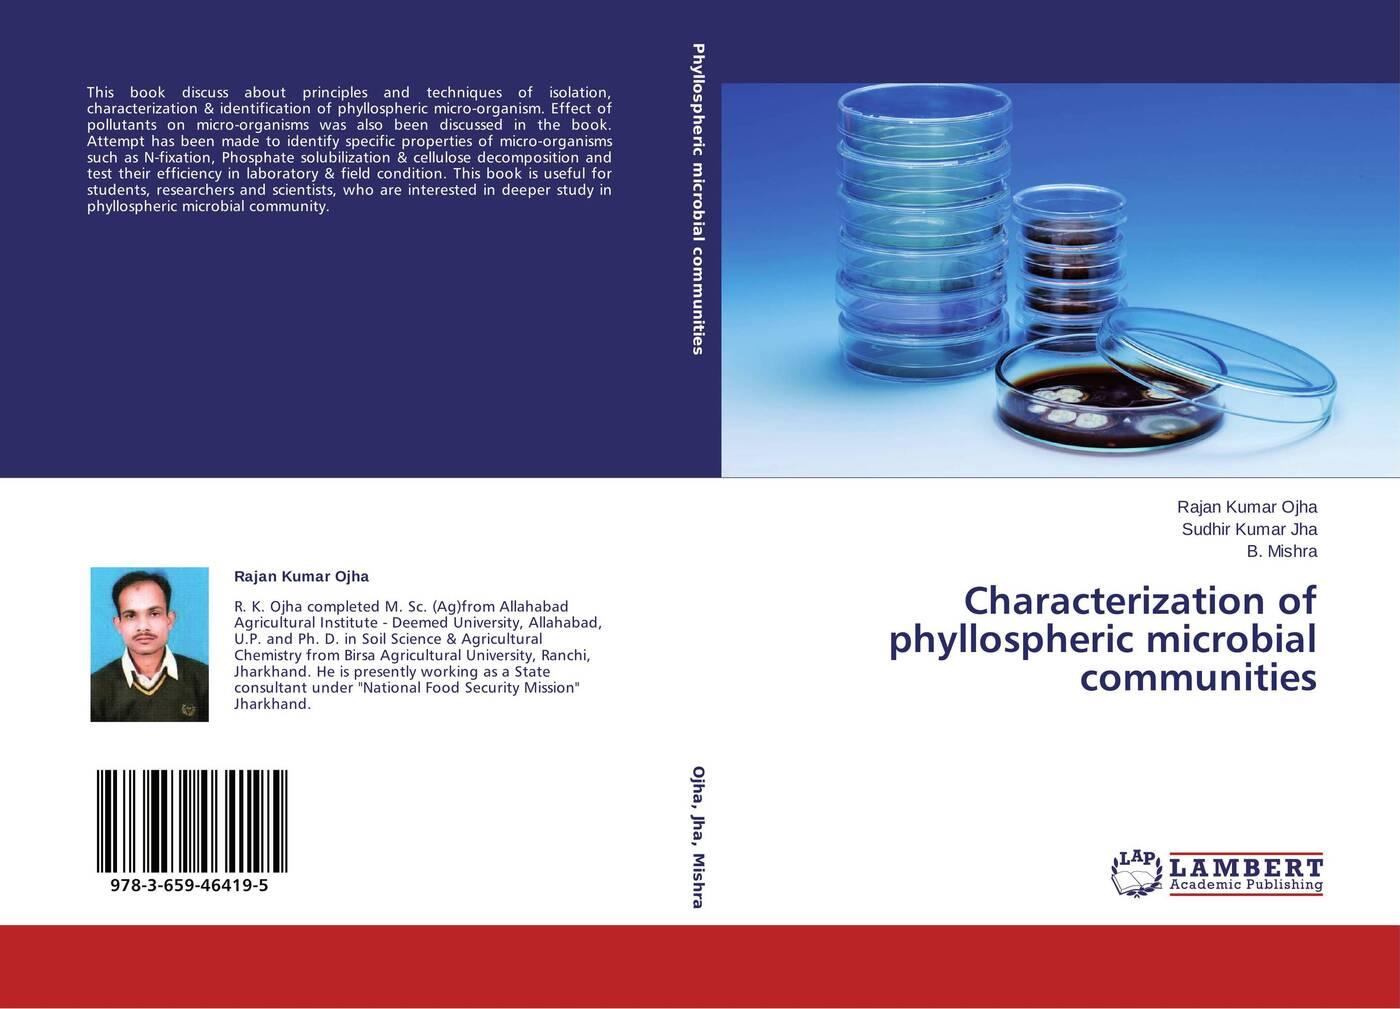 Rajan Kumar Ojha,Sudhir Kumar Jha and B. Mishra Characterization of phyllospheric microbial communities недорого